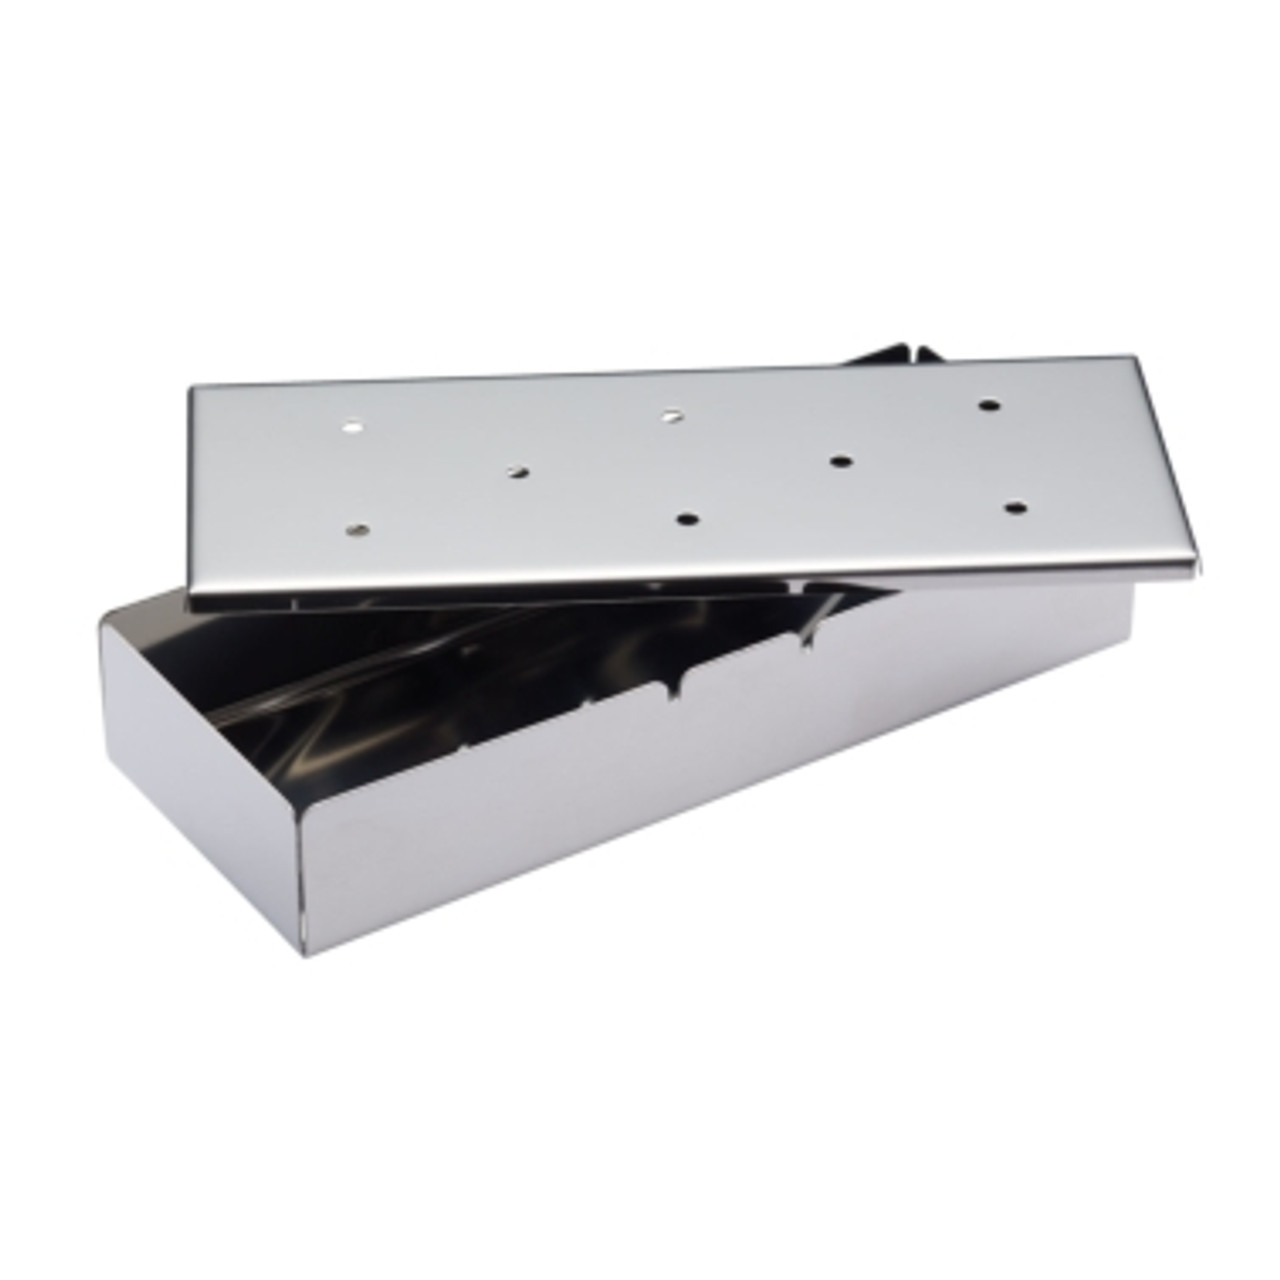 Stainless Steel Smoking Box